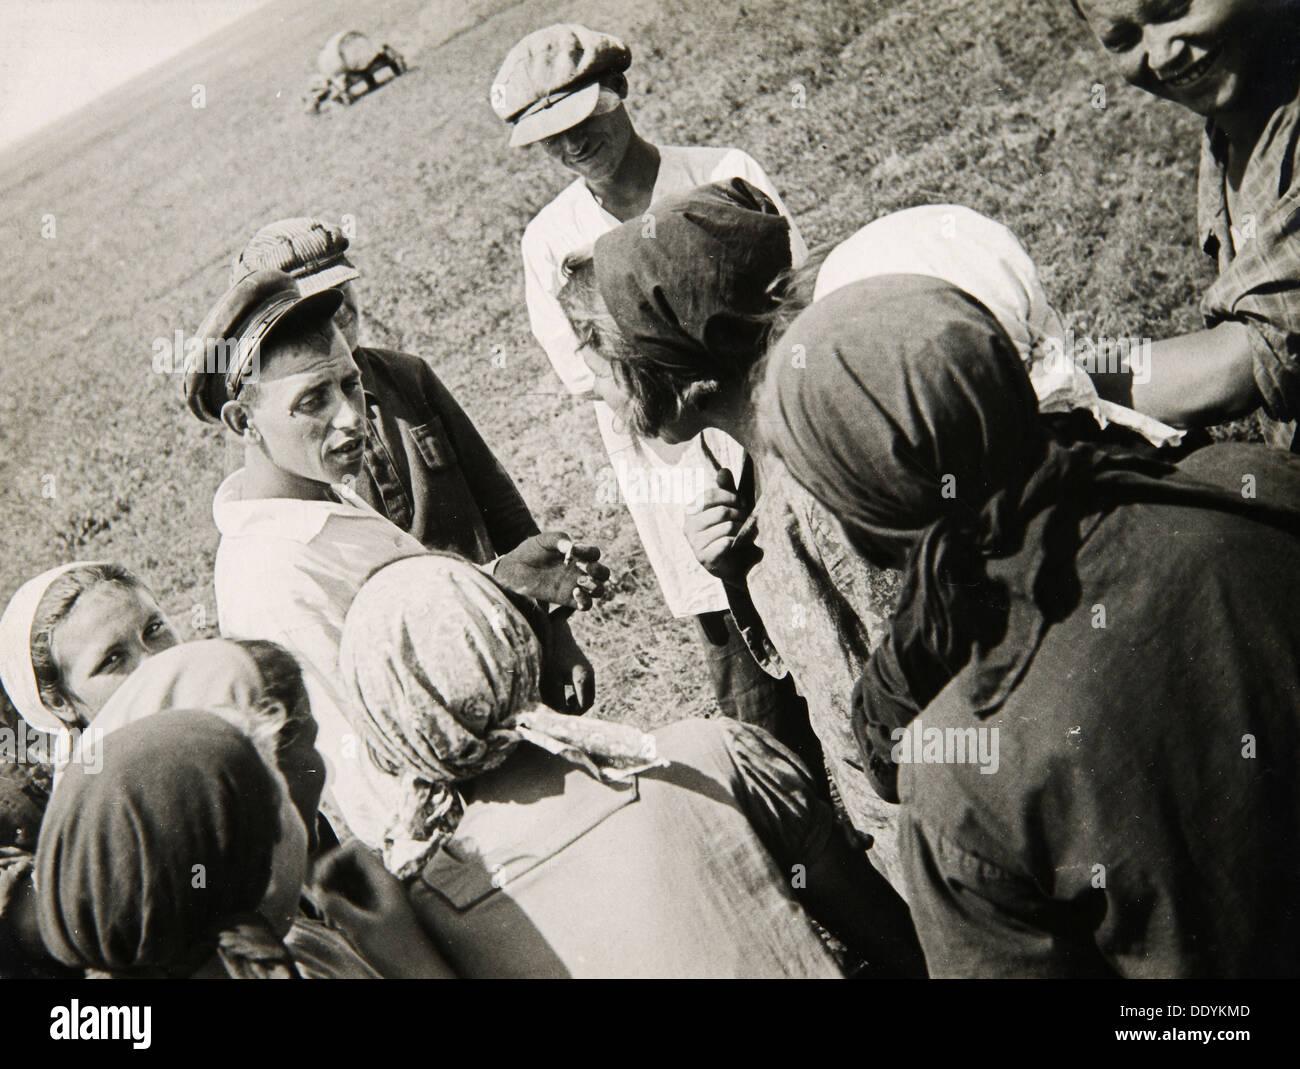 A Kolkhoz brigade taking a break, USSR, 1931. Artist: Anon - Stock Image